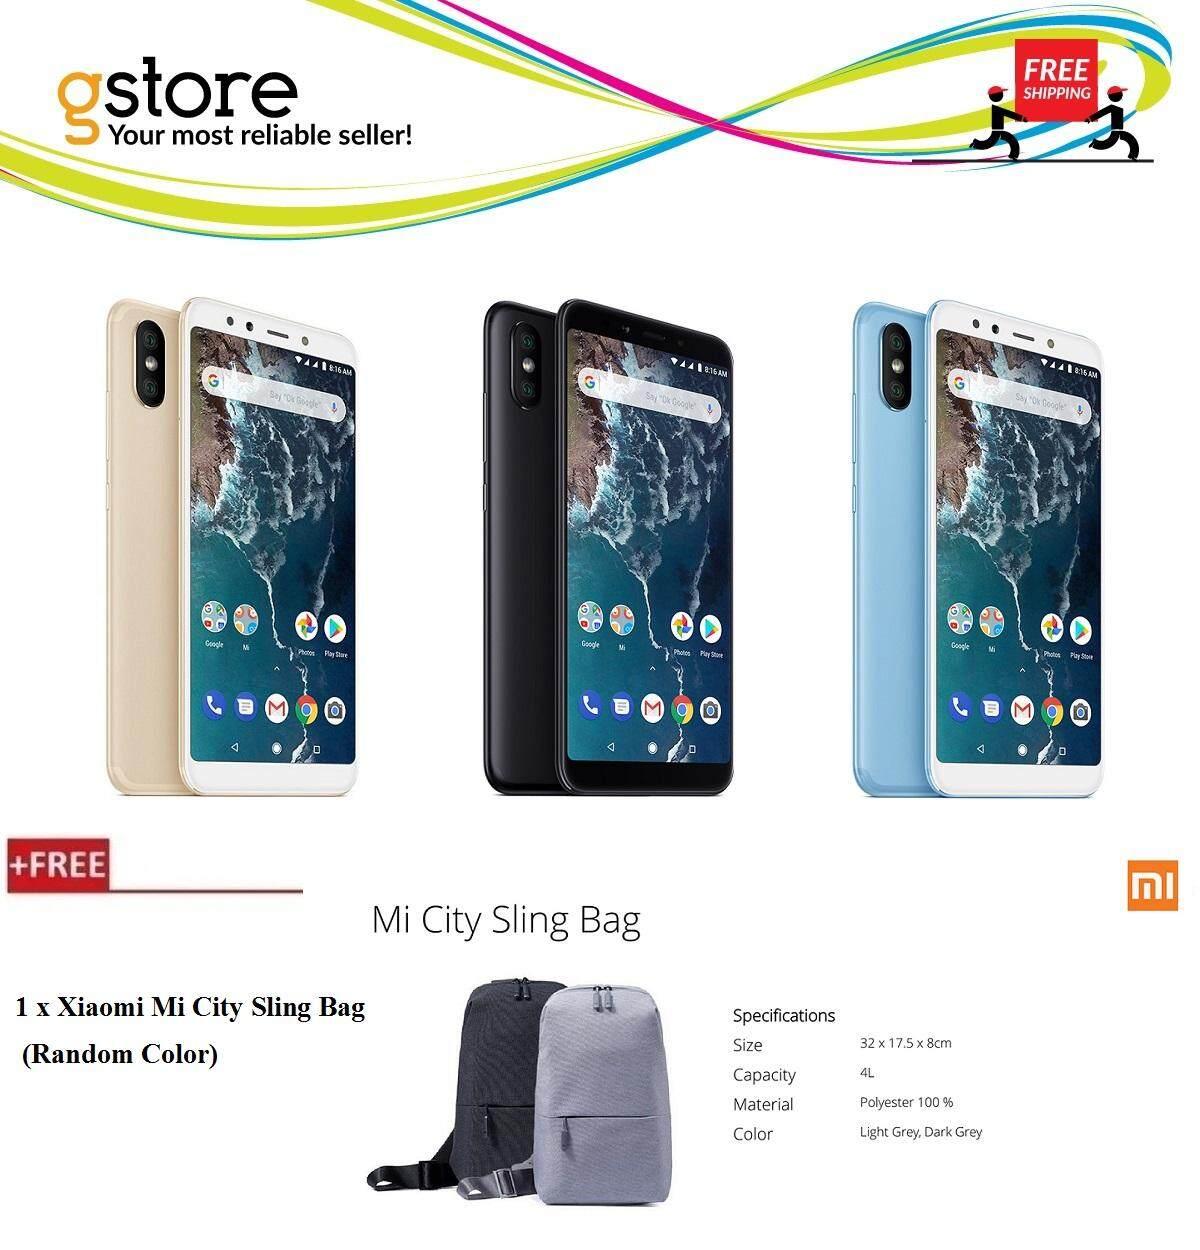 RM1169 00* Xiaomi Mi A2 -androidone [128GB ROM/6GB RAM]